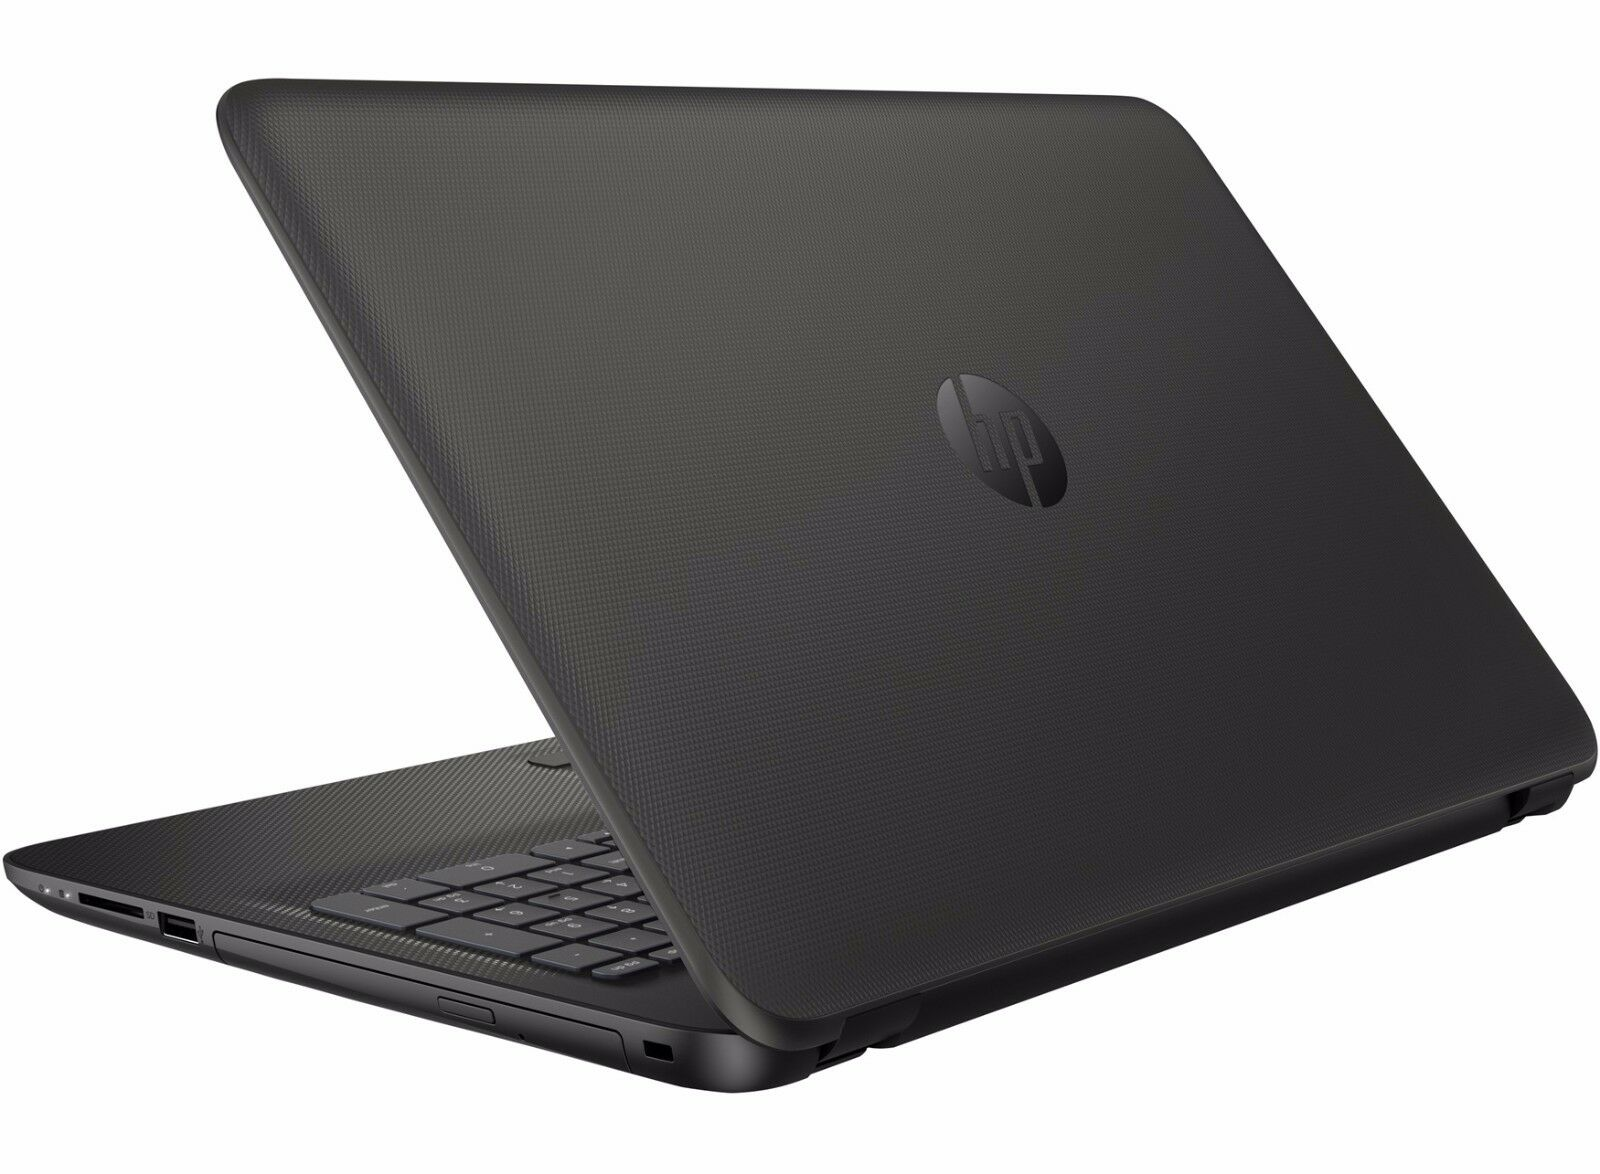 "HP 15.6"" Laptop Intel 2.16GHz 4GB 500GB DVD+RW WebCam HDMI Wireless Windows 10"